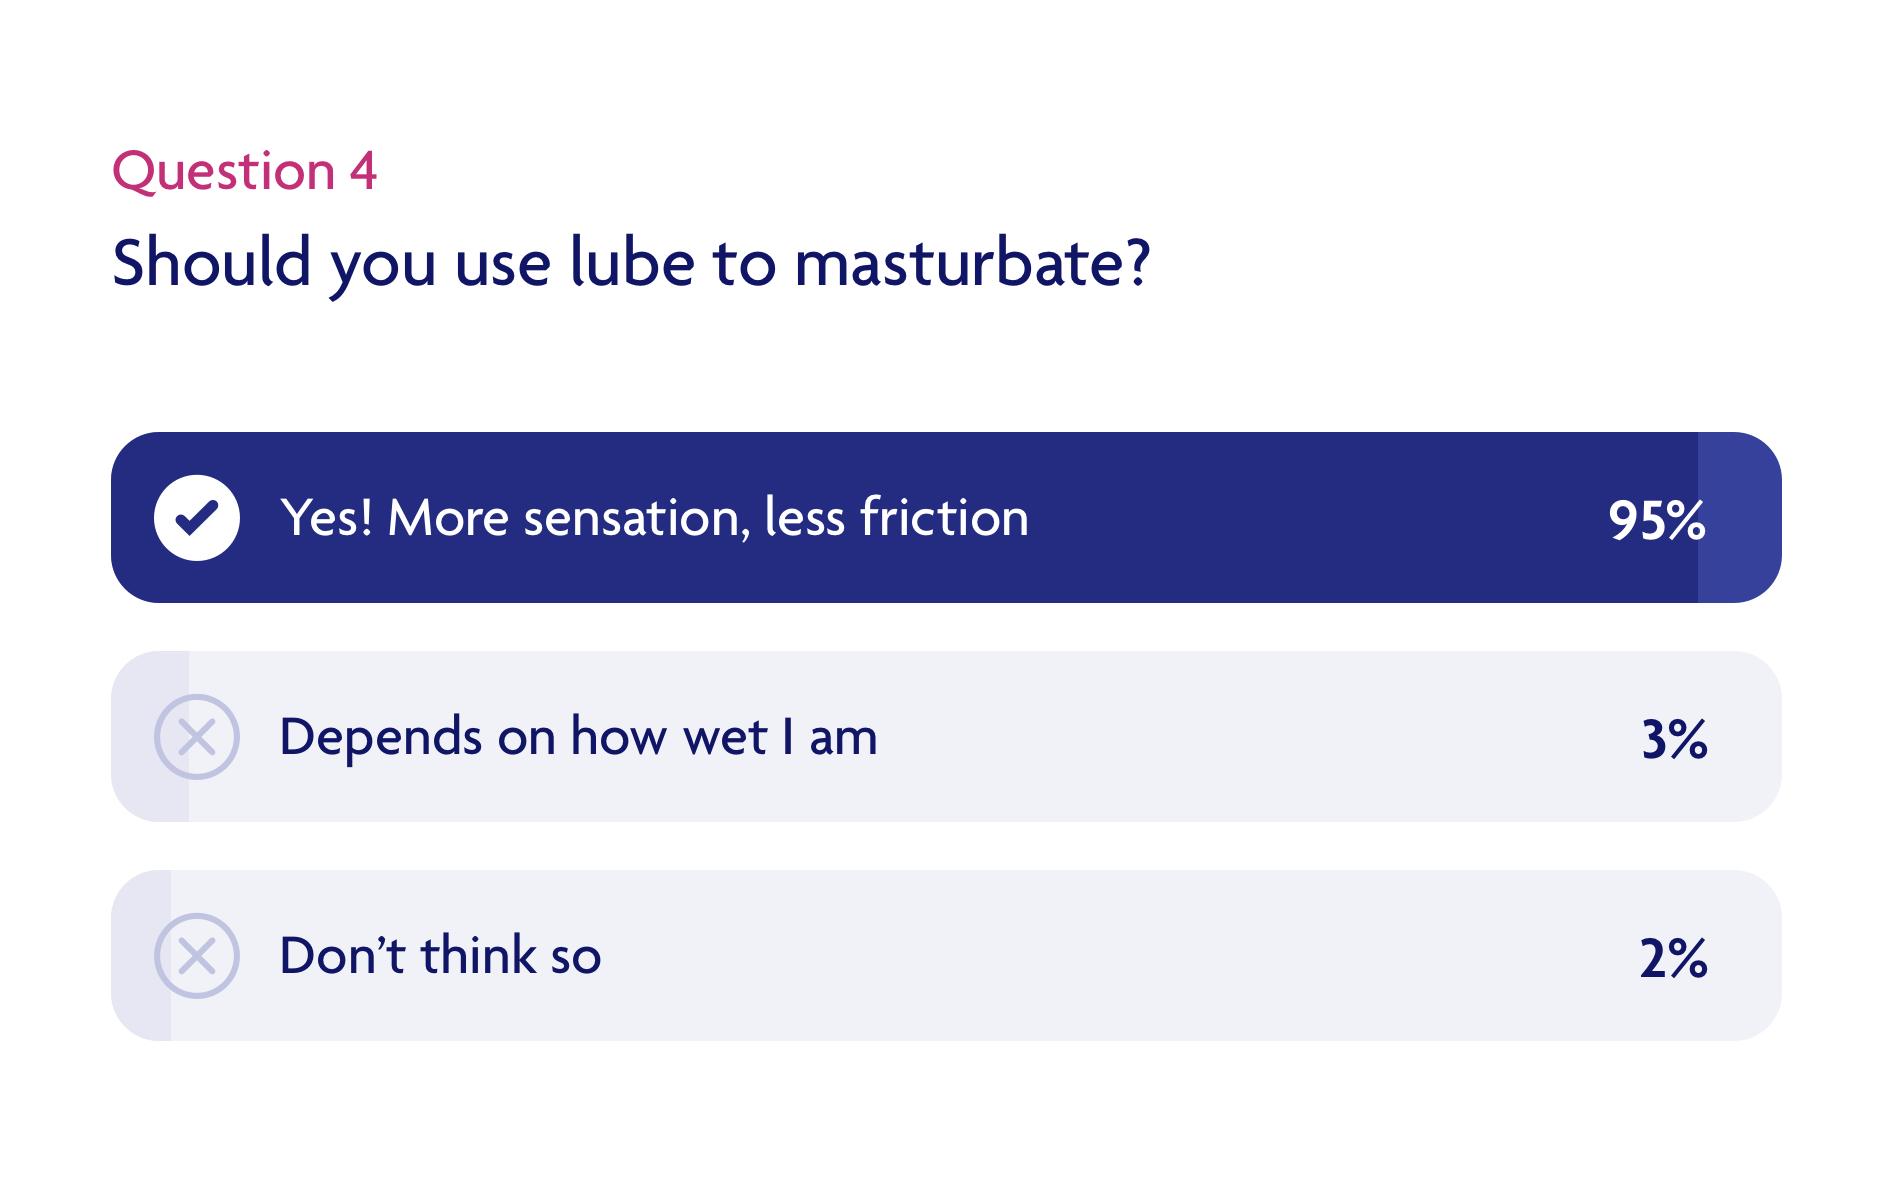 Should you use lube to masturbate?